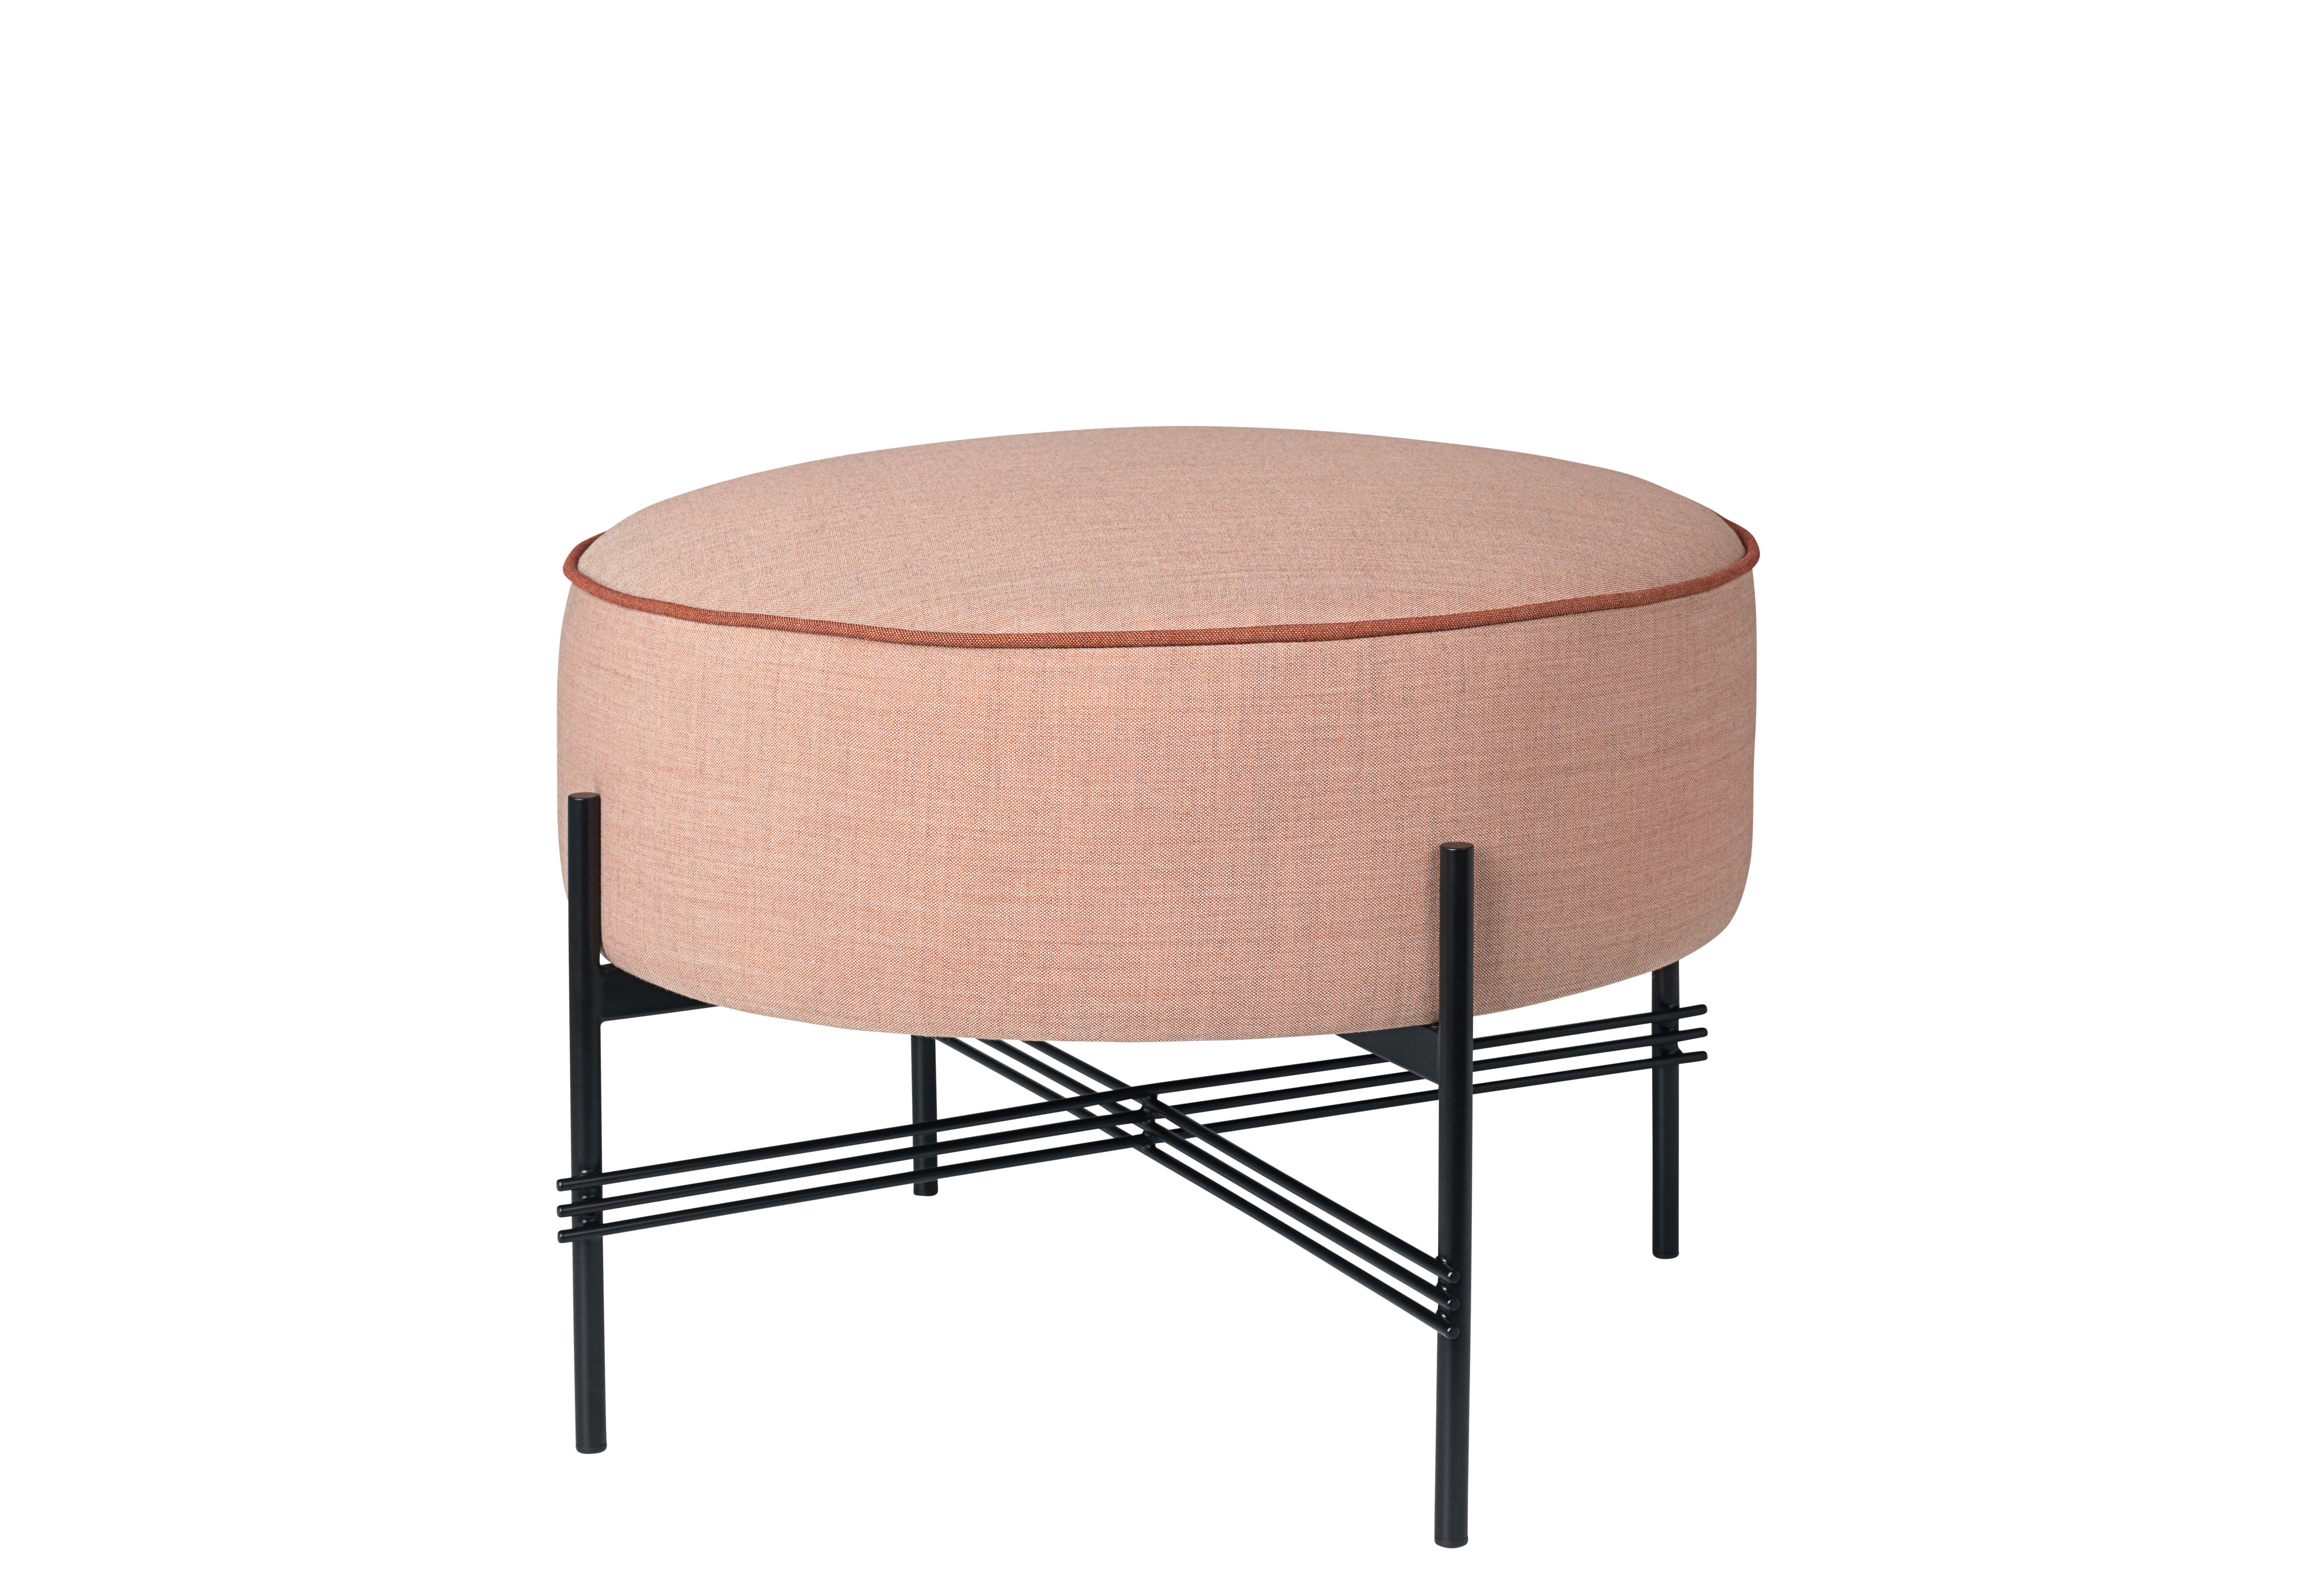 Furniture - Poufs & Floor Cushions - TS Pouf - Fabric/Gamfratesi - Ø 55 cm by Gubi - Ø 55 cm/Pink fabric - Fabric, Foam, Lacquered metal